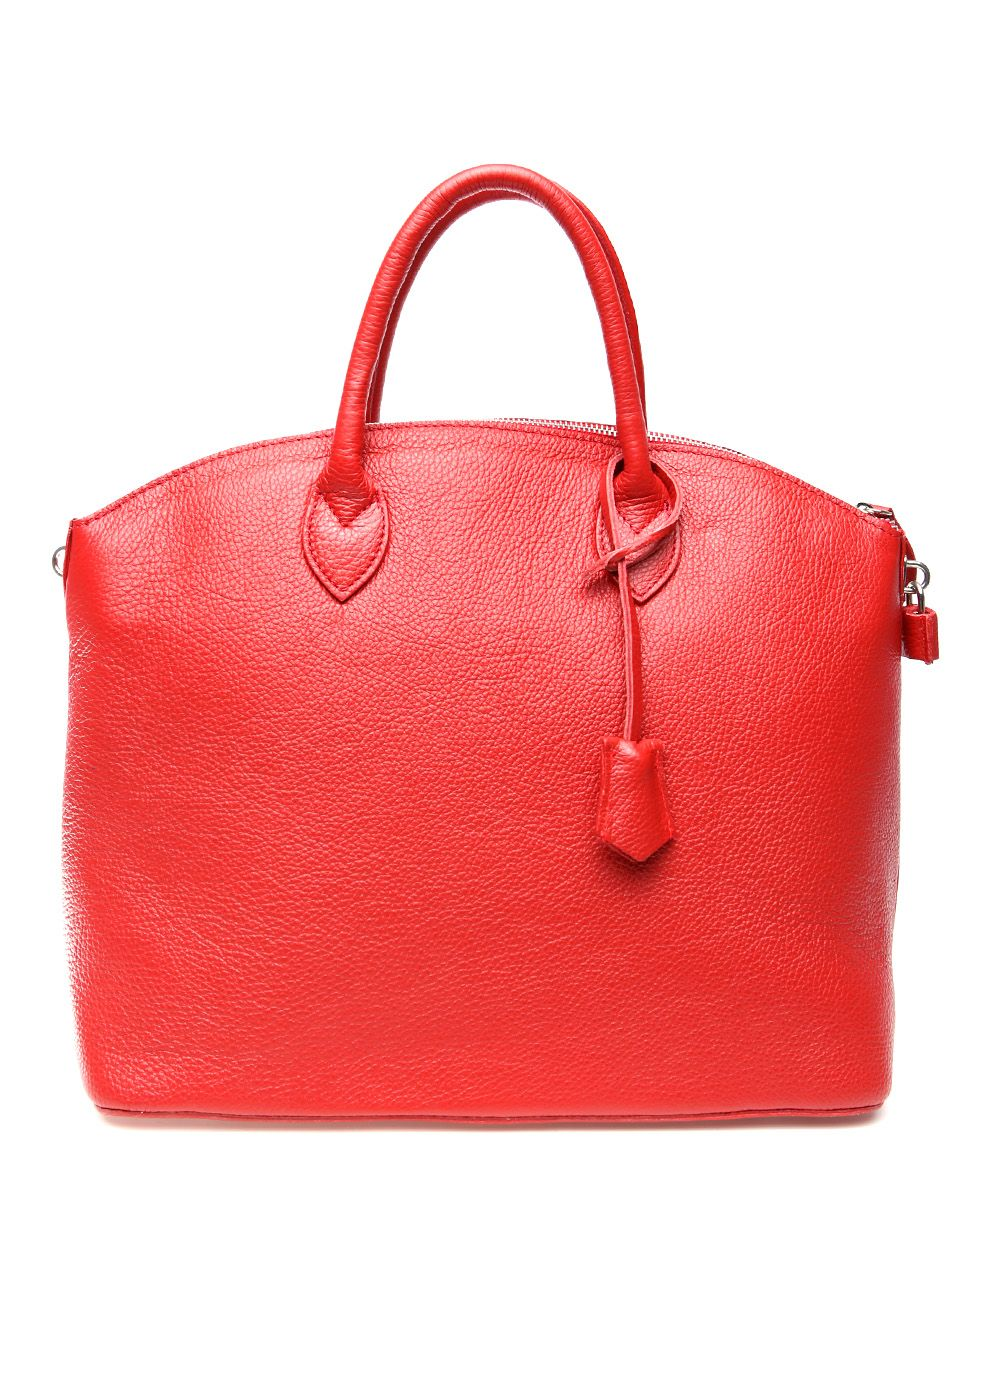 37f92c0a7771 Marla Fiji Bags Annie Red Bag